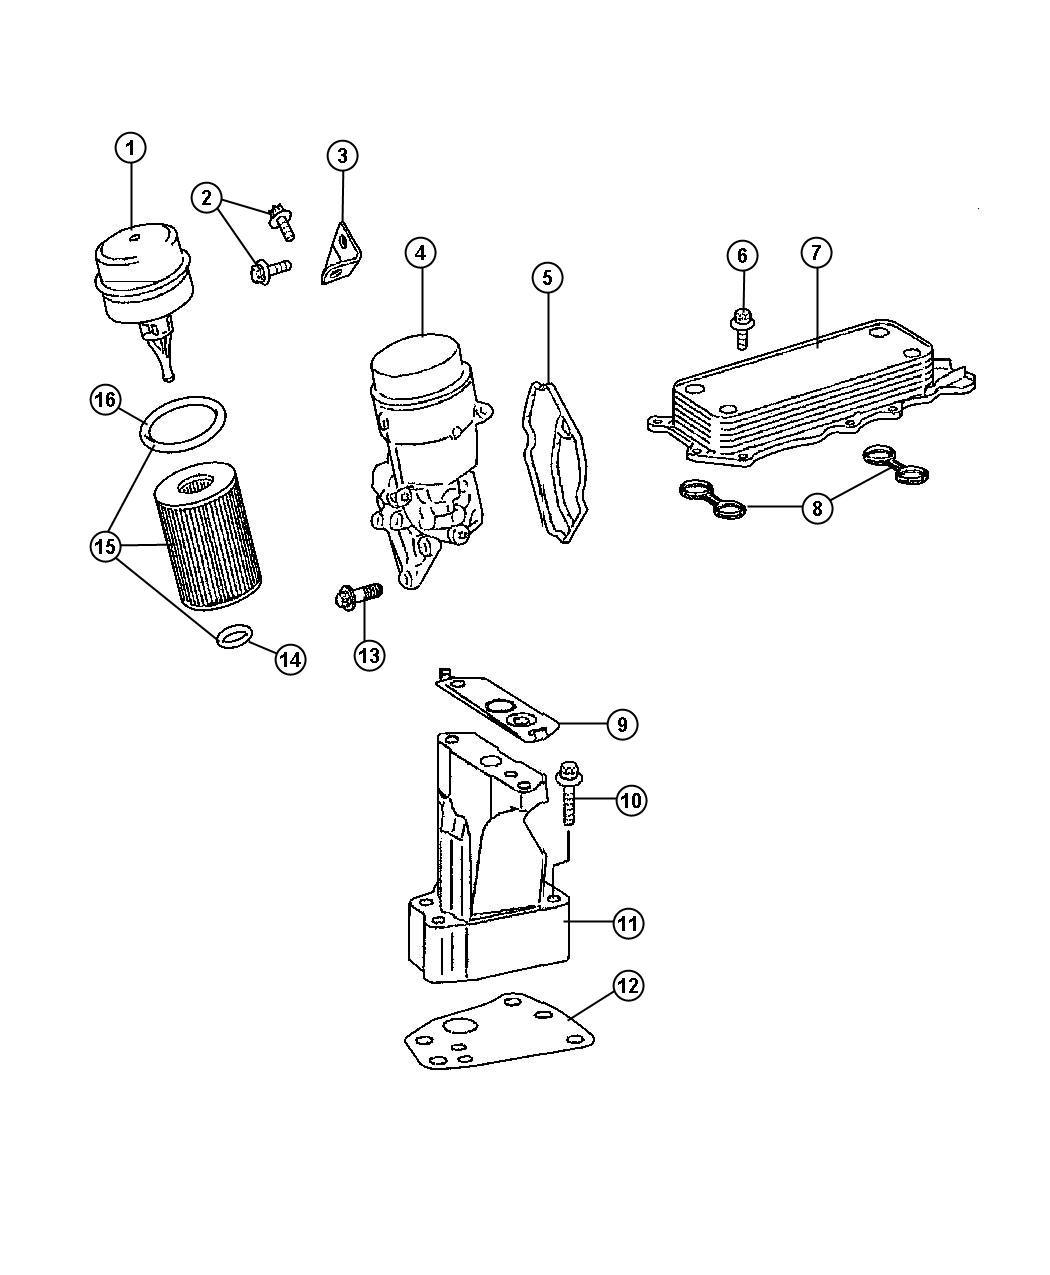 2013 Jeep Compass Cooler. Oil. Engine, filter, diesel